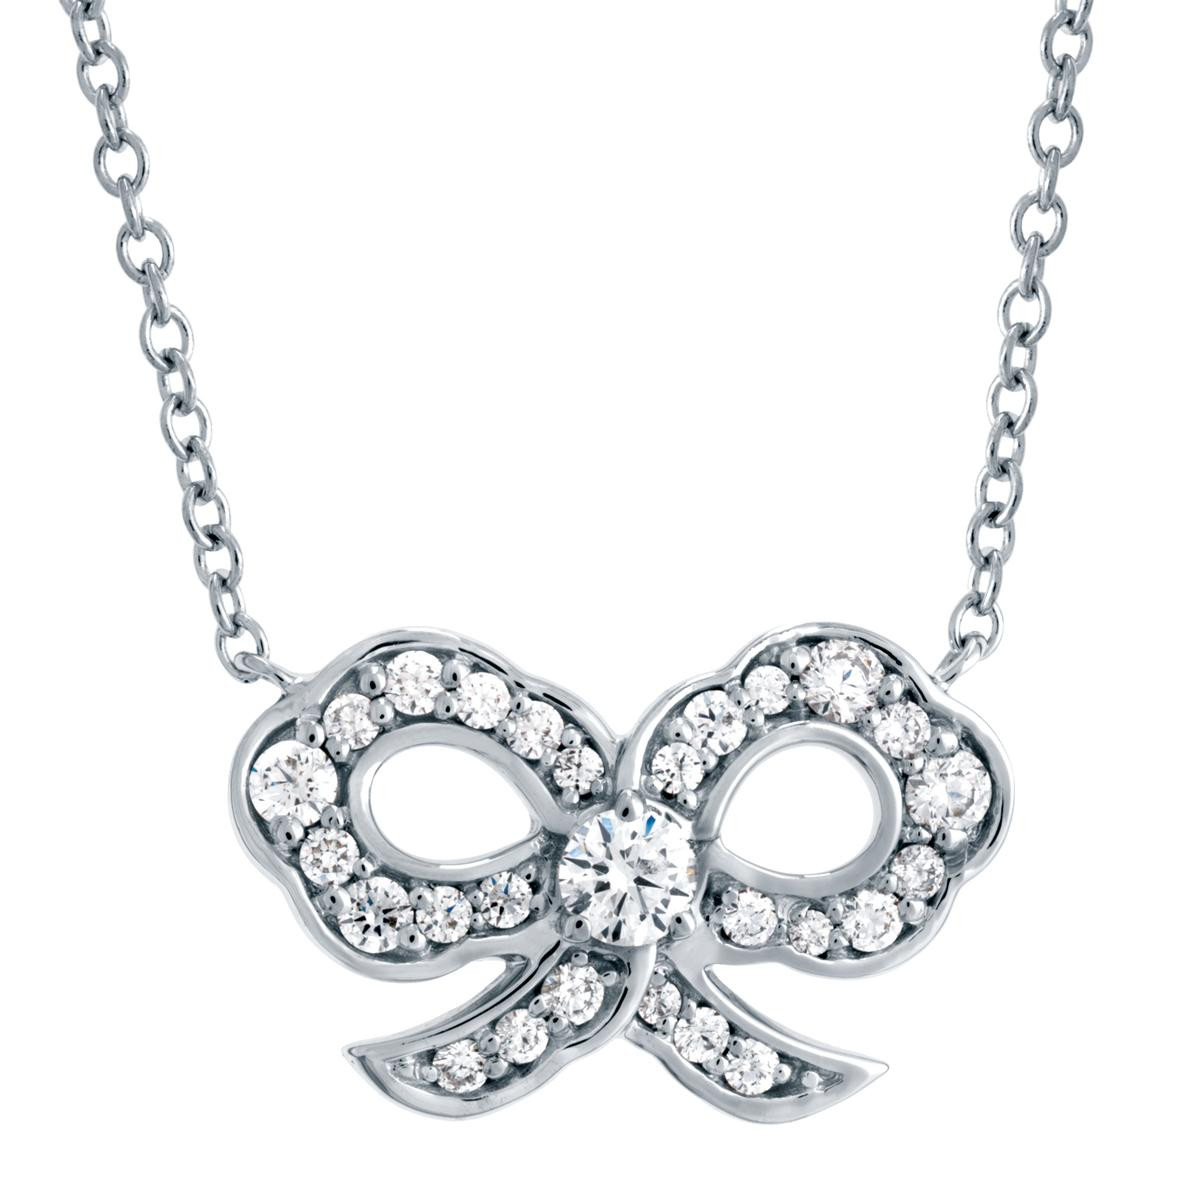 New Hearts On Fire® Diamond Lorelei Bow Necklace